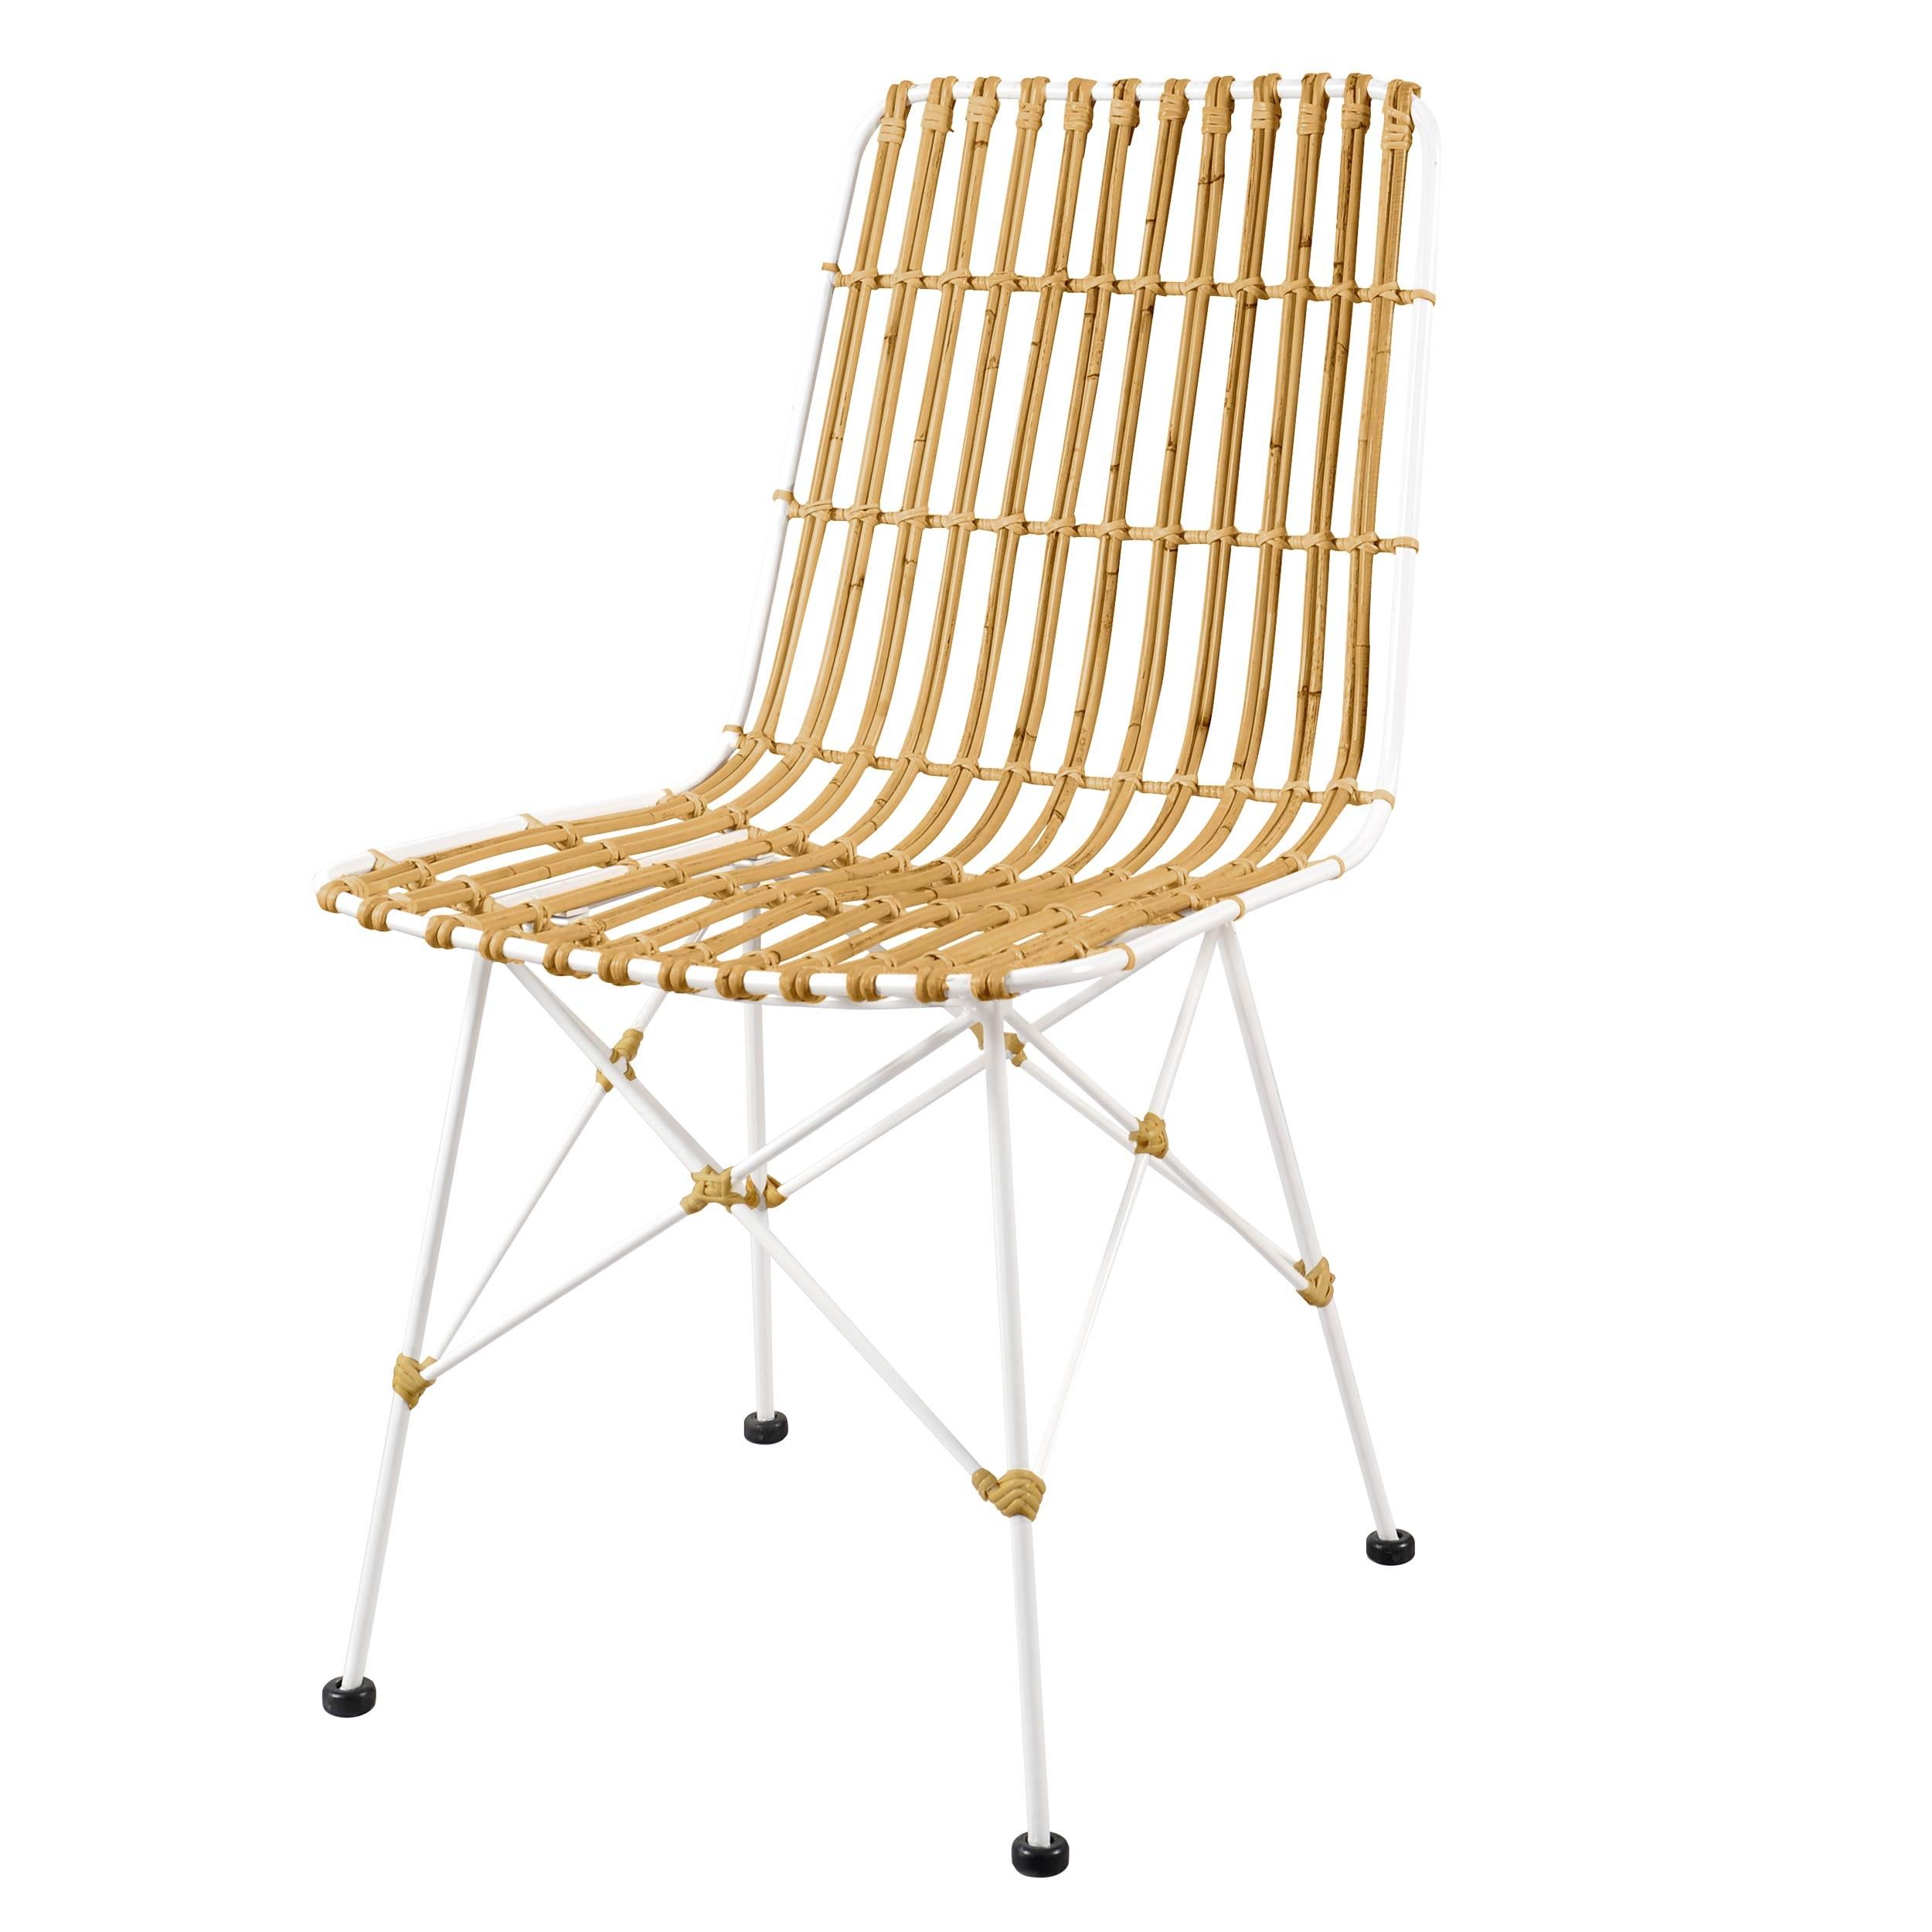 acheter chaise rotin naturel - Chaise En Rotin